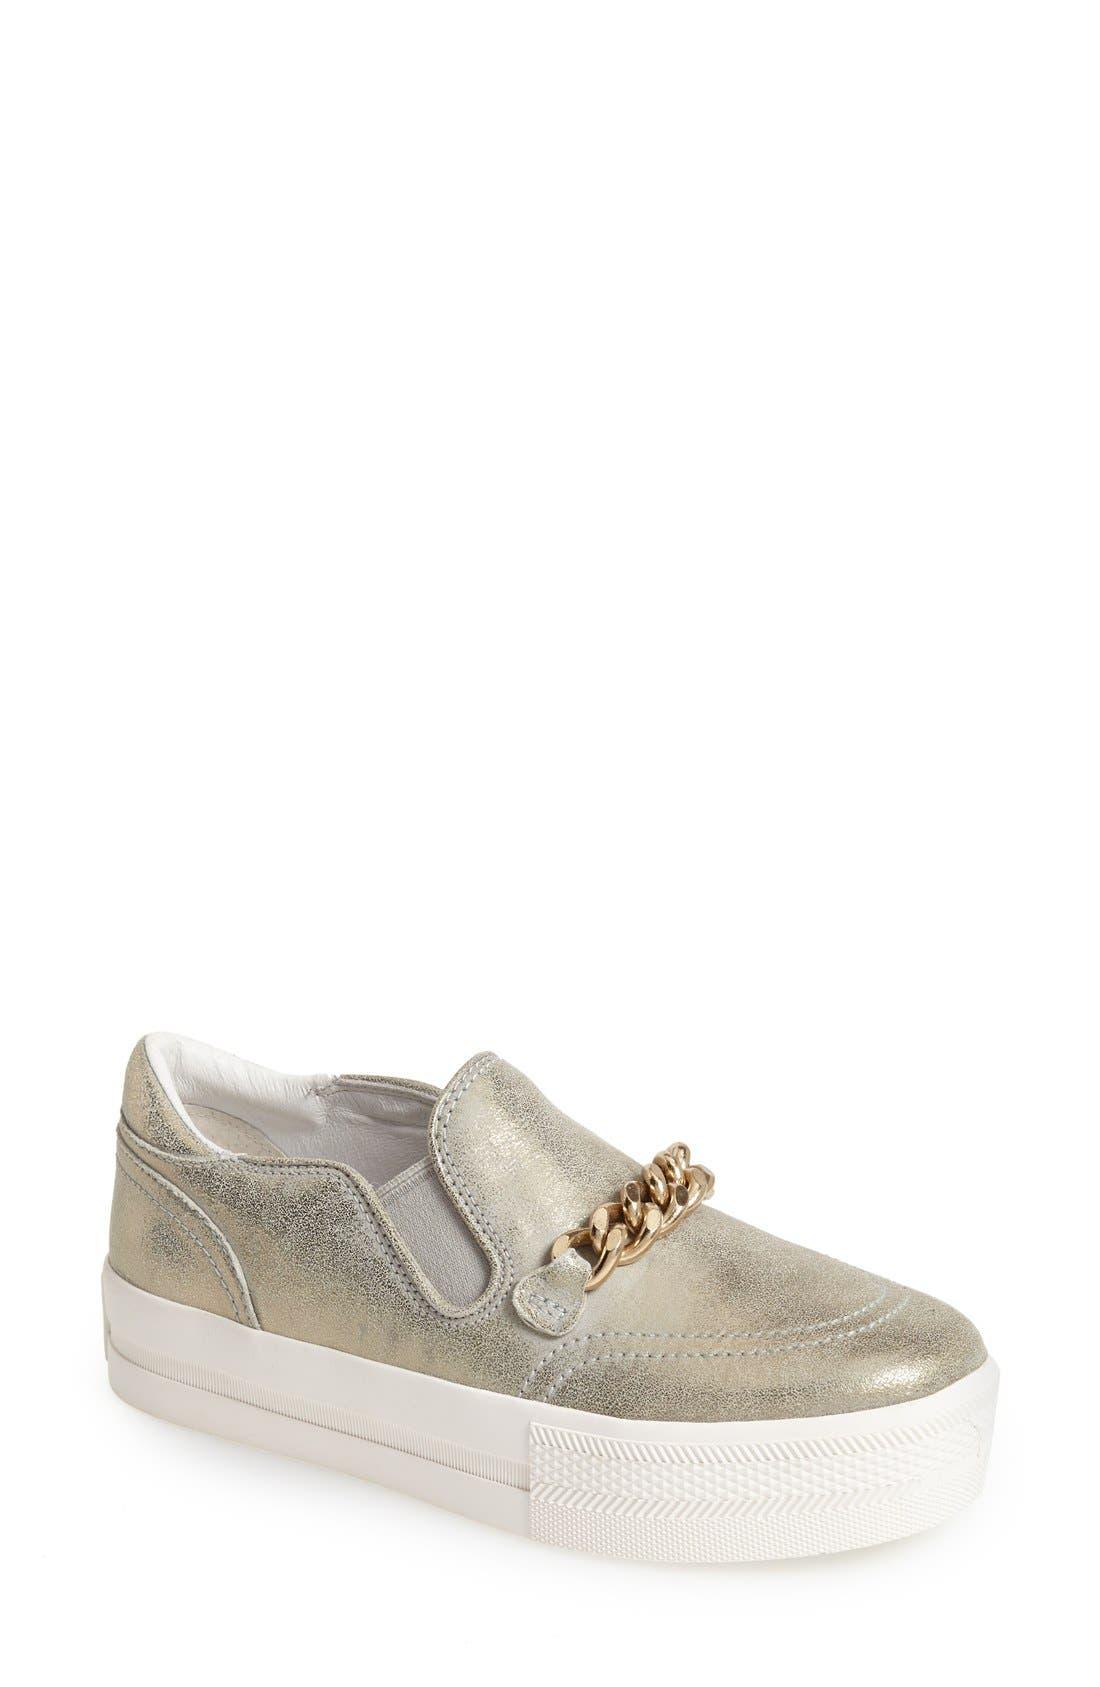 Alternate Image 1 Selected - Ash 'Joe' Platform Sneaker (Women)